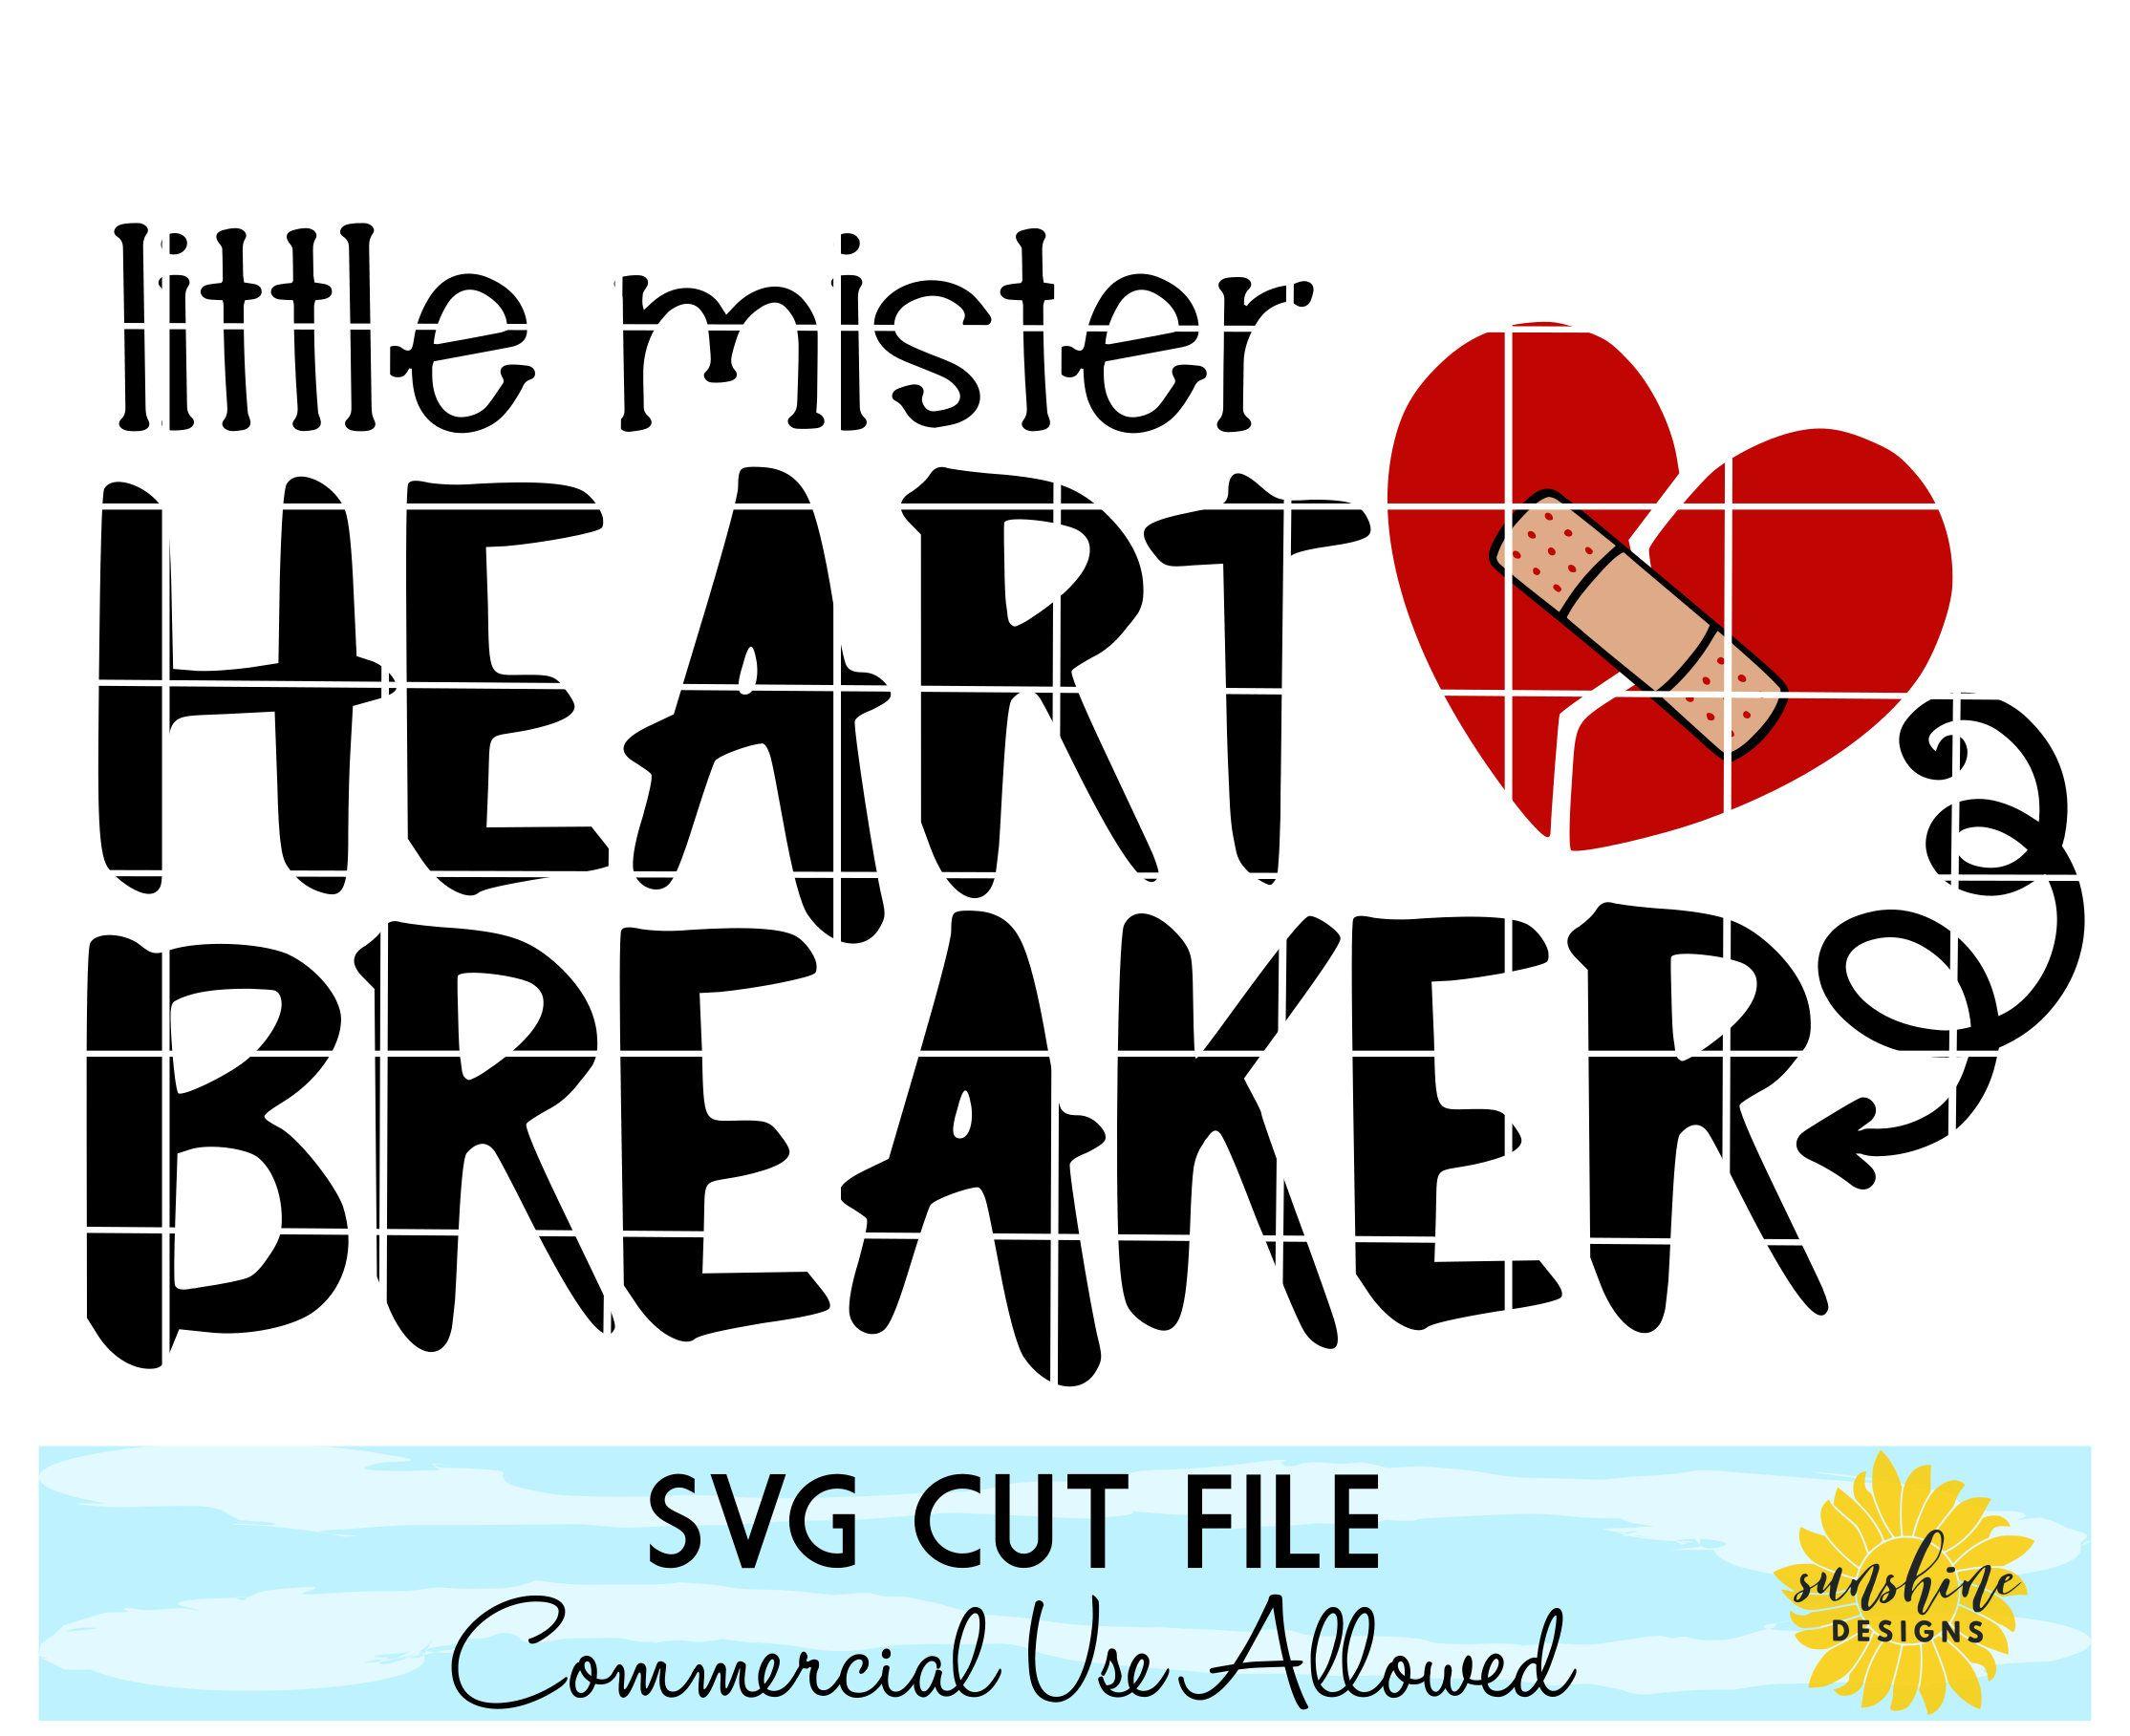 Valentine S Day Svg Little Mister Heart Breaker Svg Dxf Png Valentine S Day Tshirt Funny Svg Kids Svg Boys Shirt Svg Toddler Svg Funny Svg Funny Tshirt Design Heart Breaker Svg